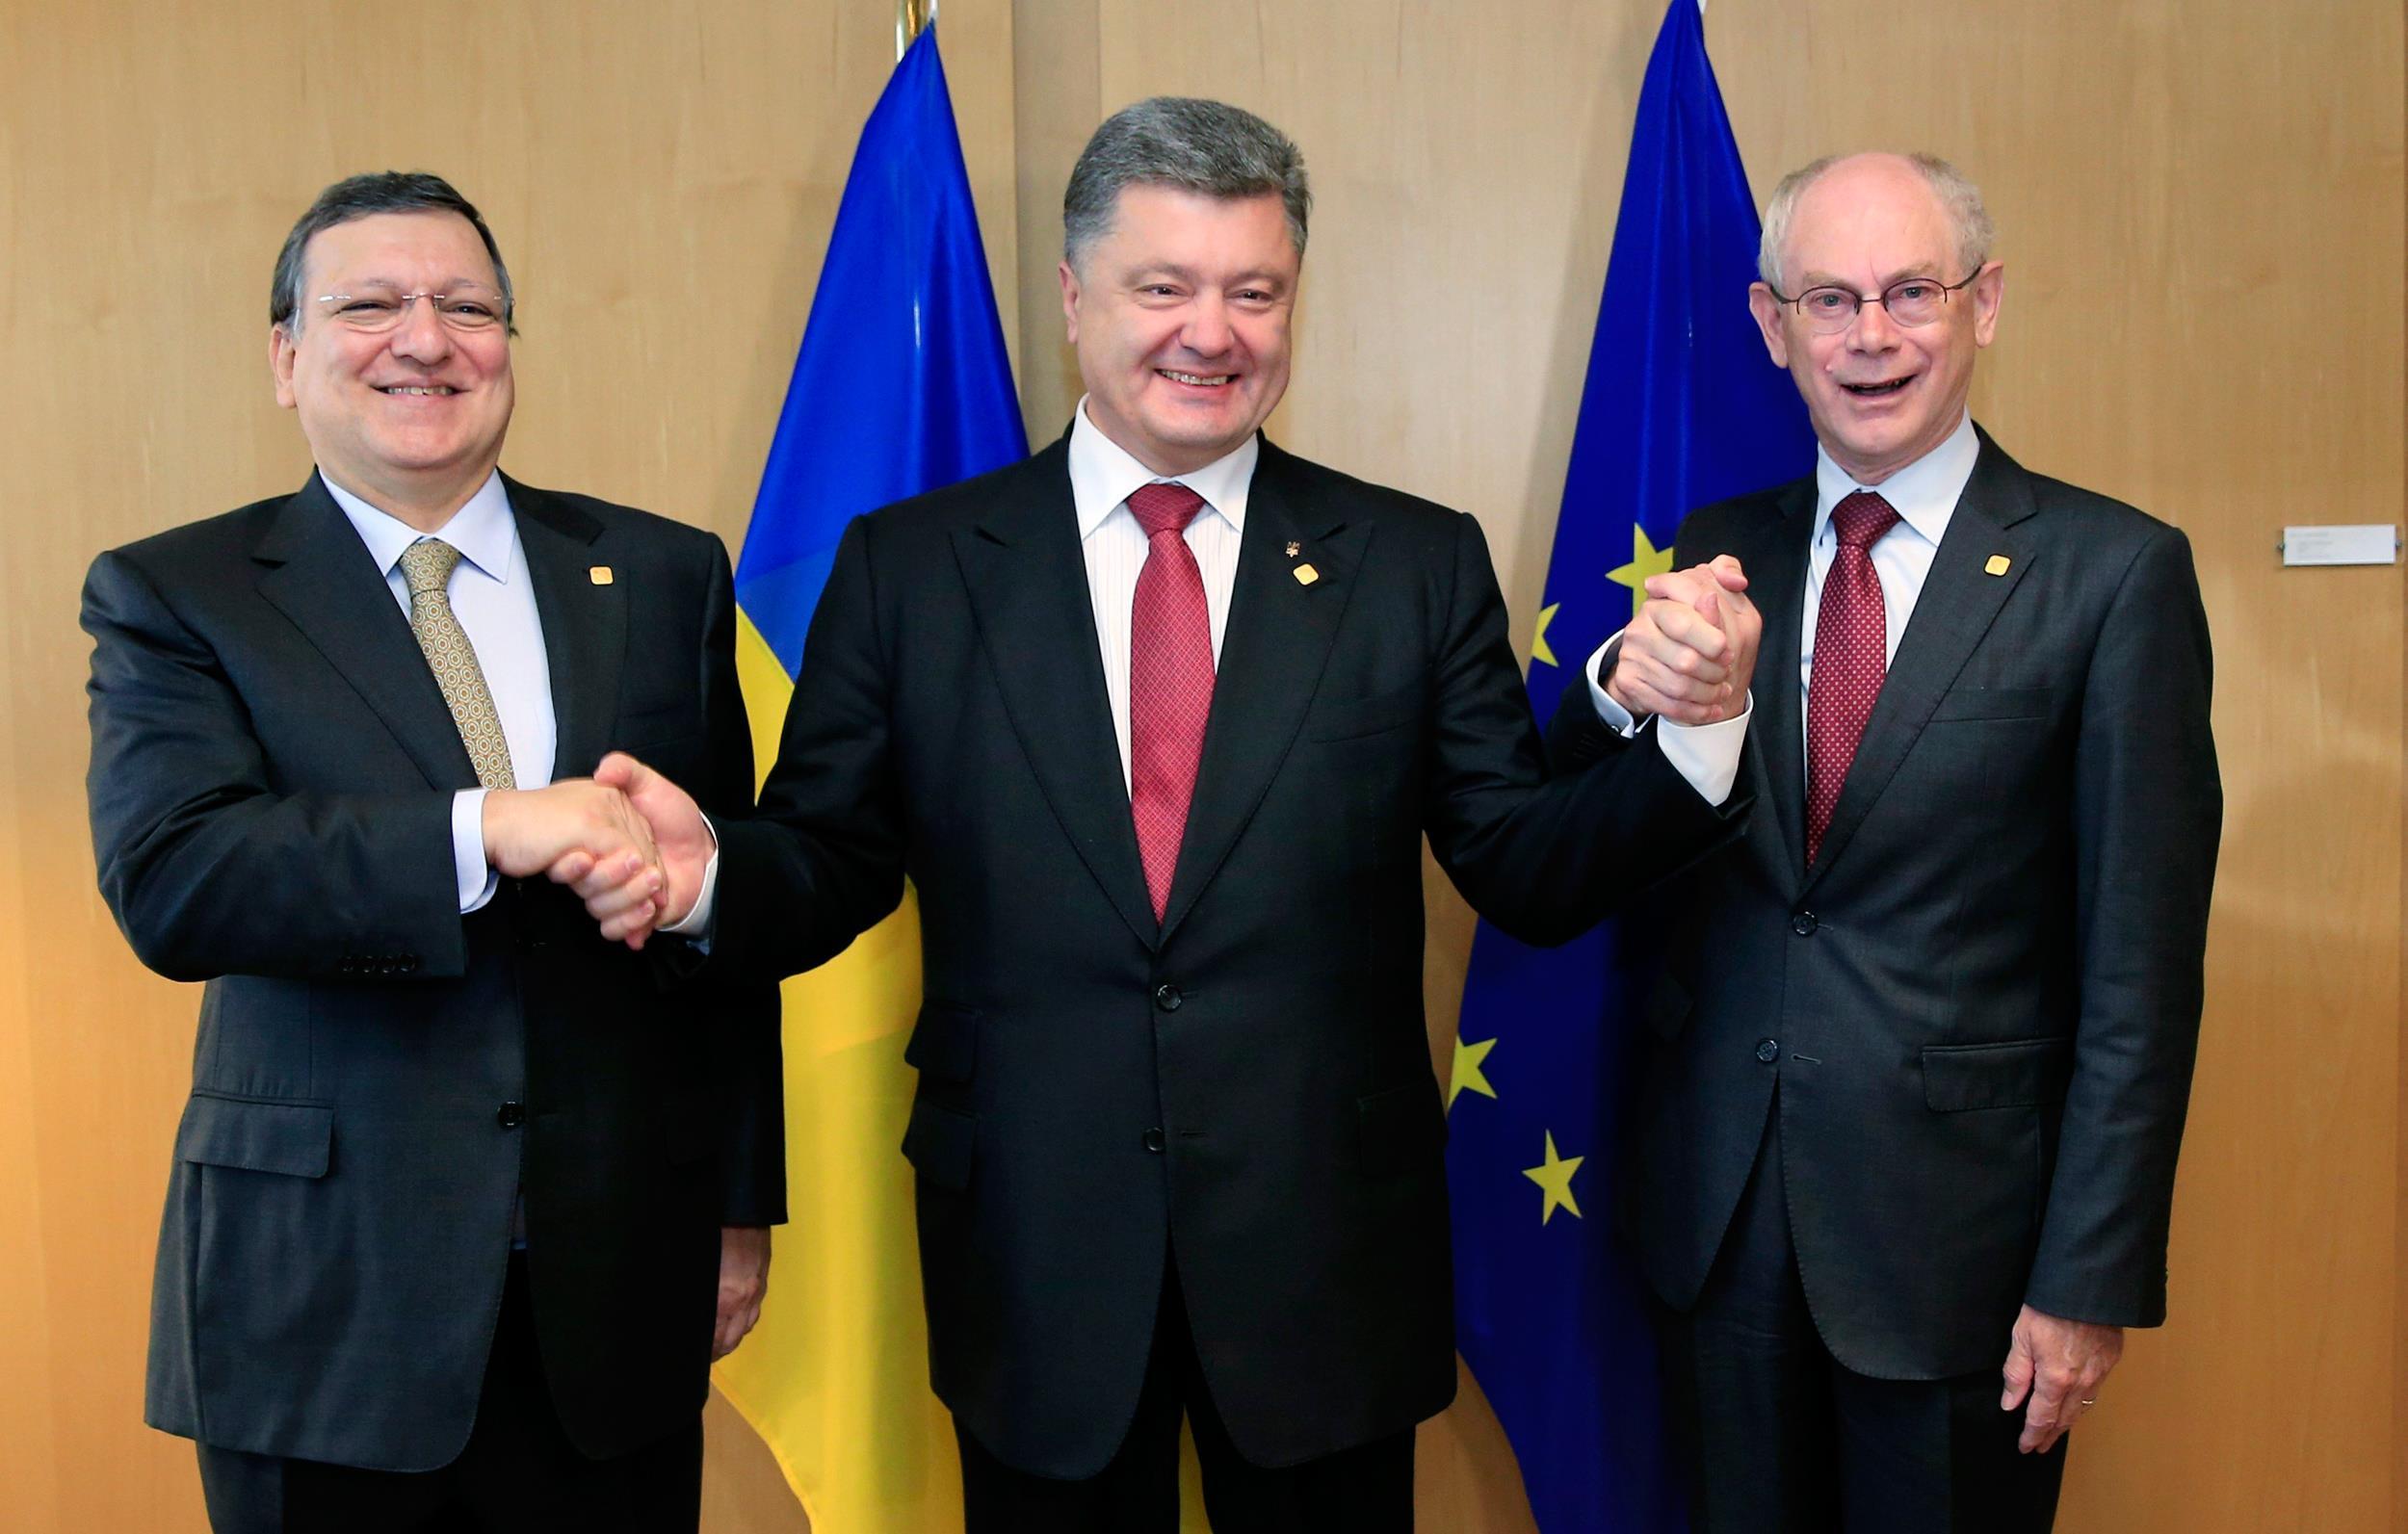 Image: Ukraine's President Poroshenko poses with European Commission President Barroso and European Council President Van Rompuy at EU Council in Brussels